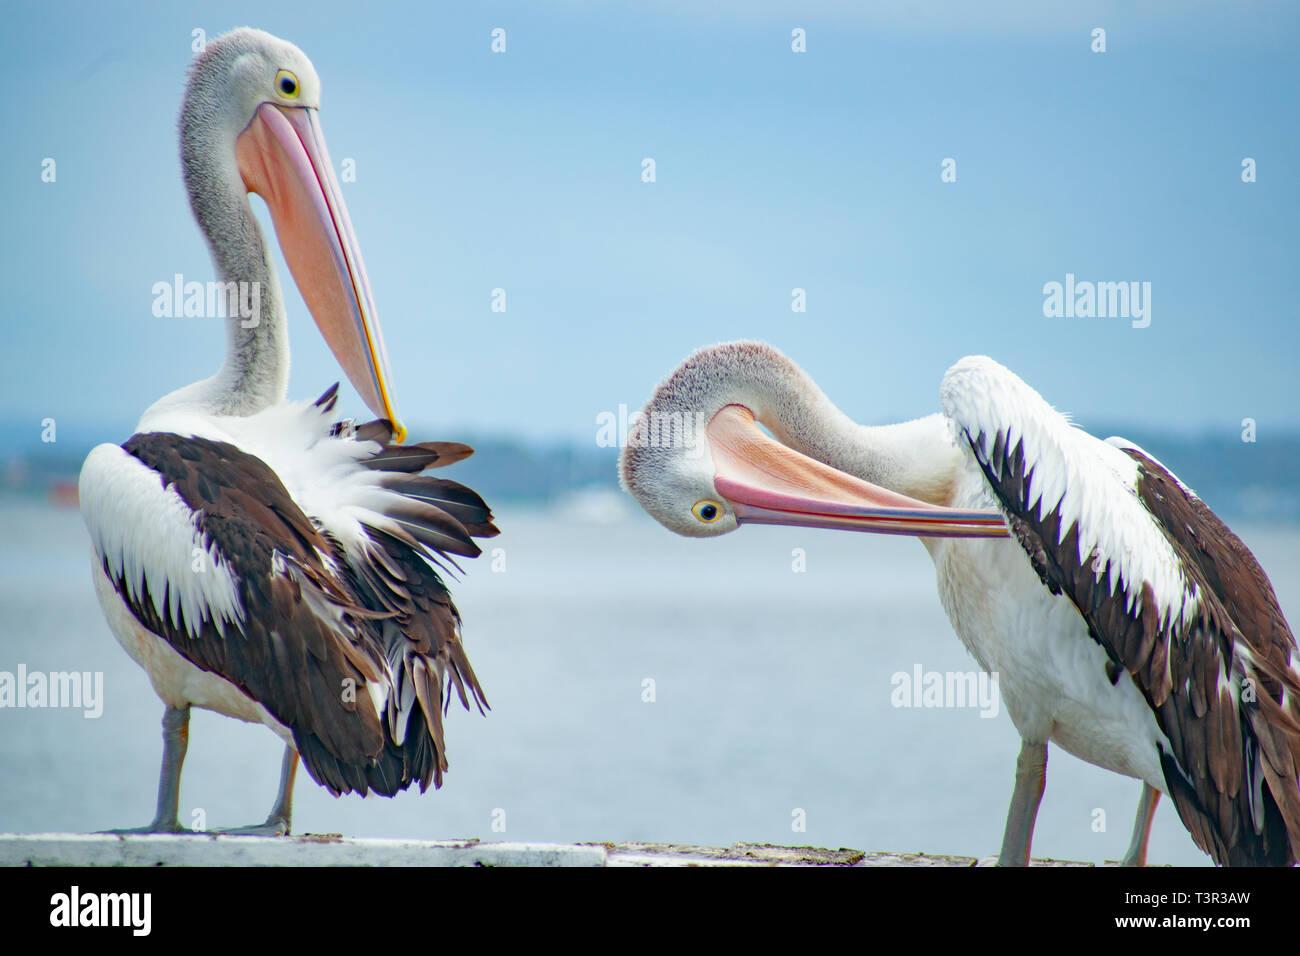 Pelecanus conspicillatus, Australian pelican standing on pier Stock Photo